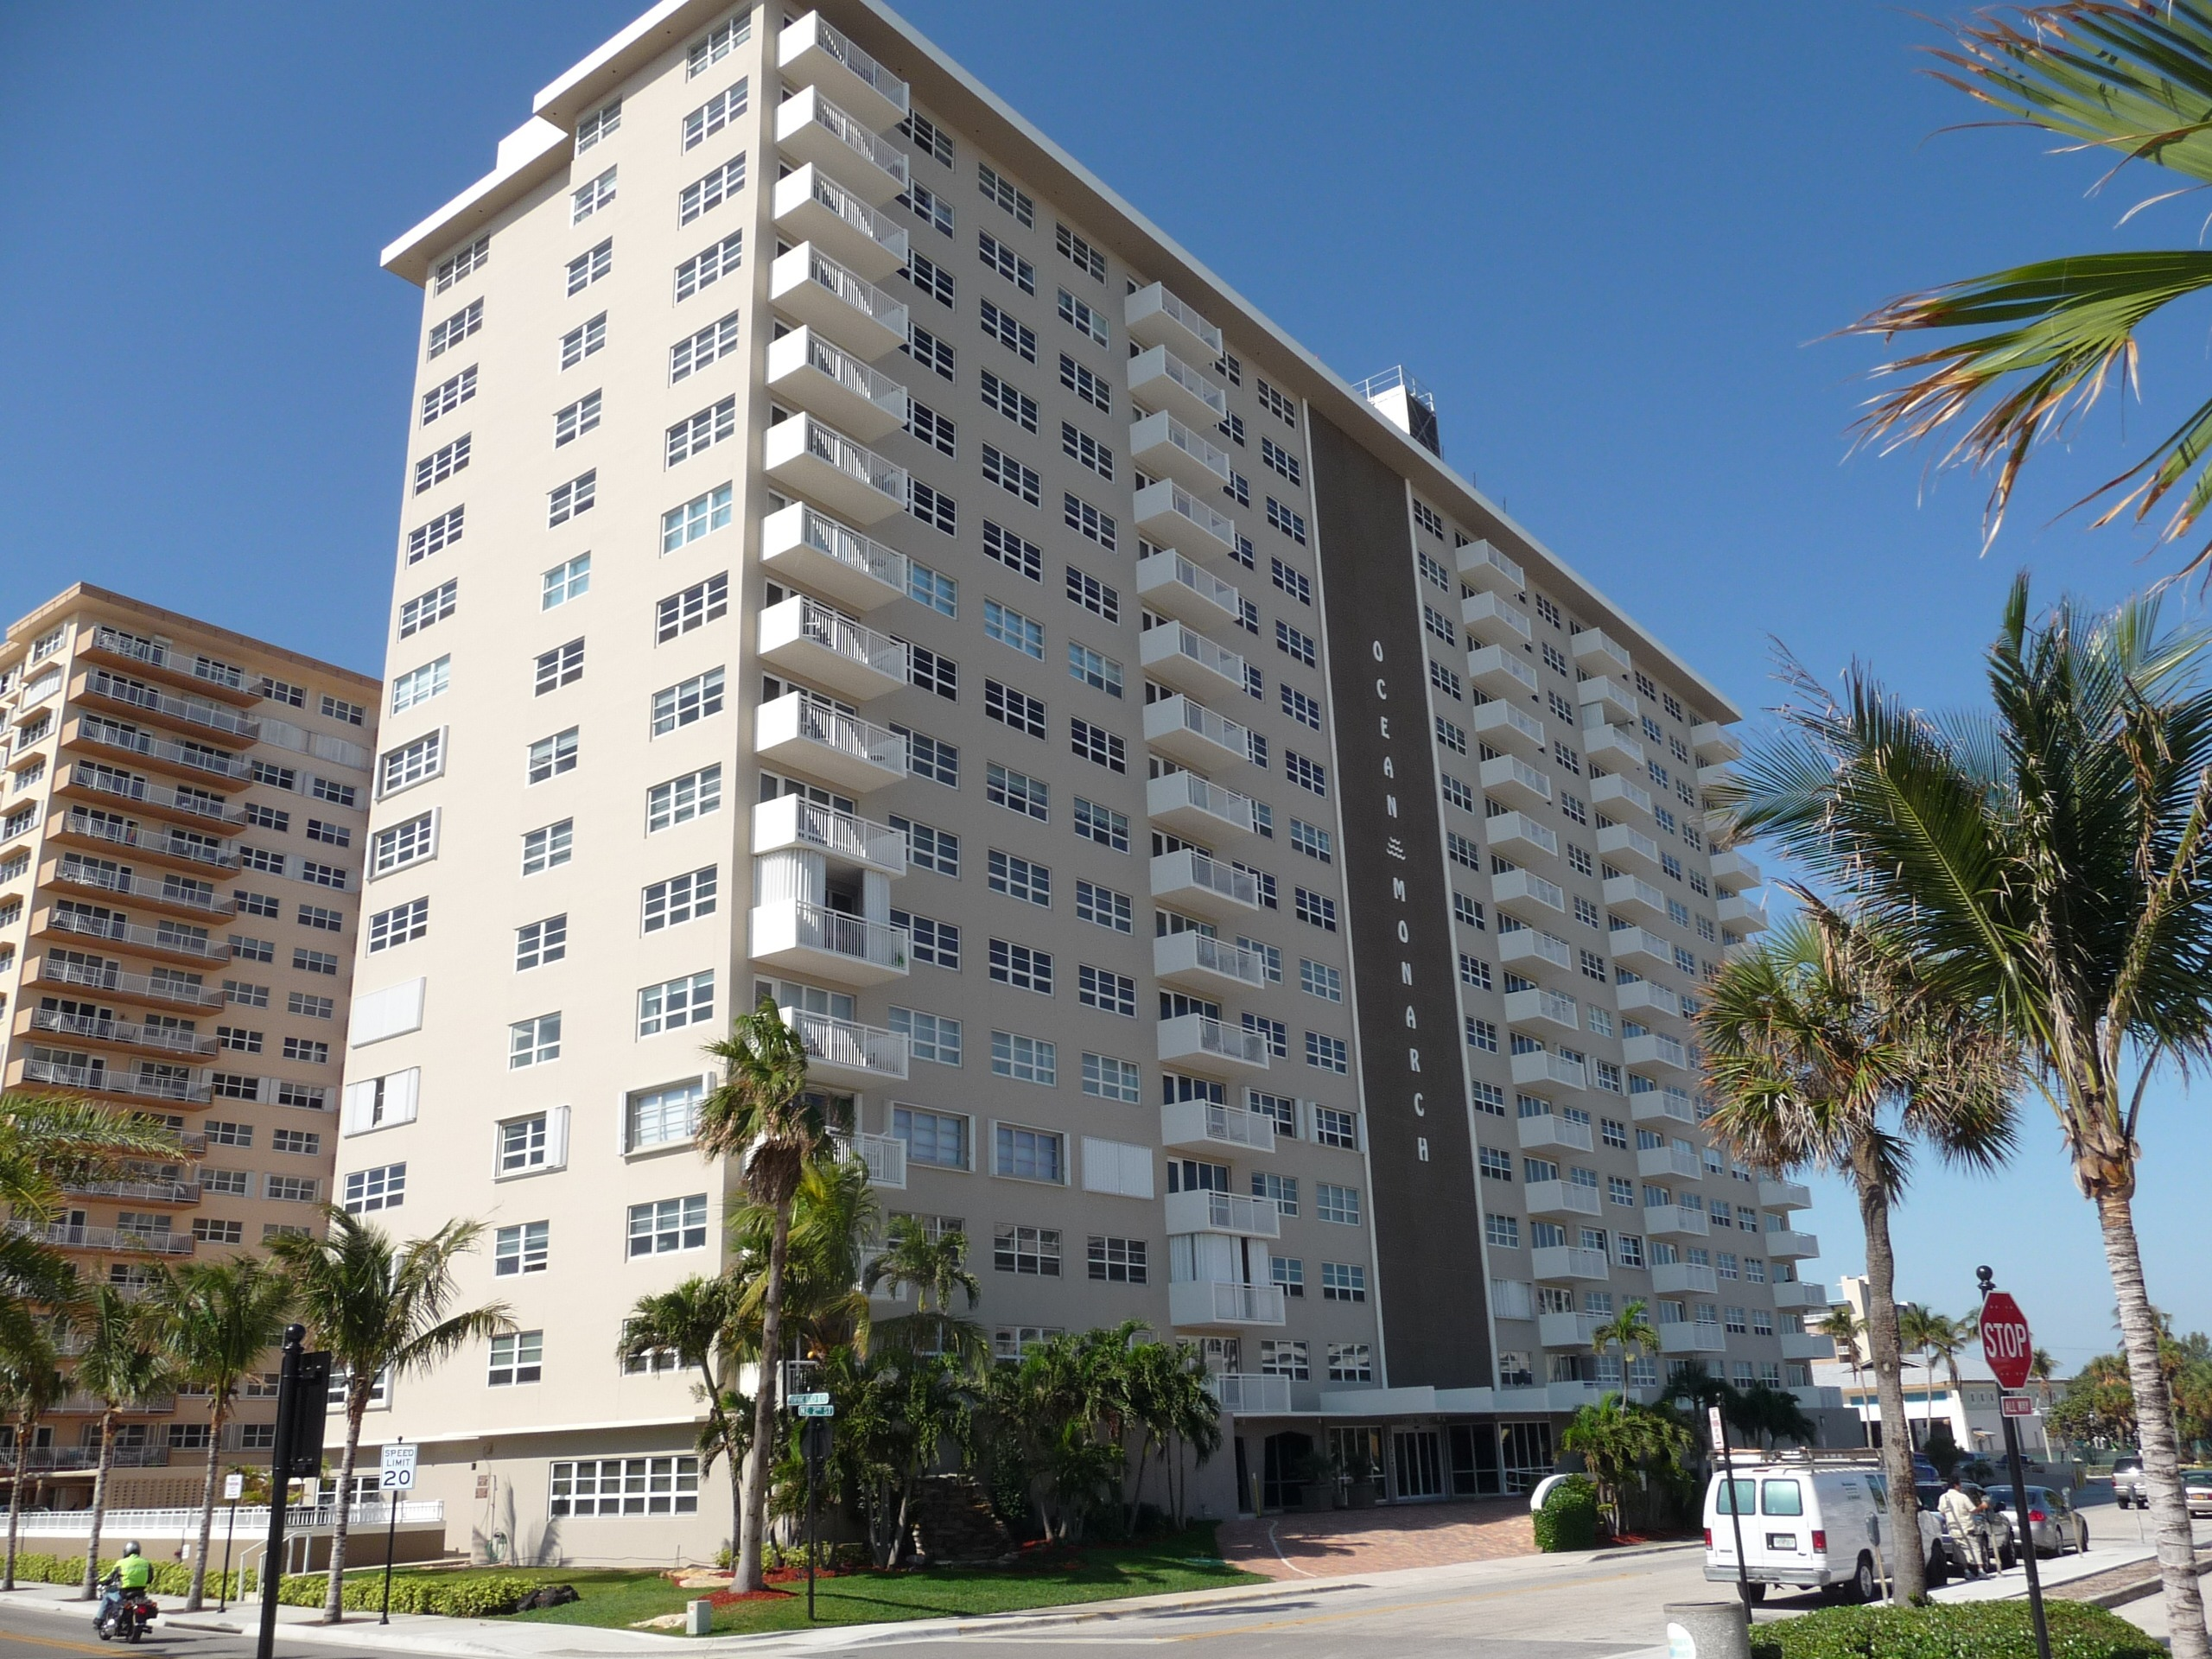 Ocean Monarch - Pompano Beach, FL Condos for Sale